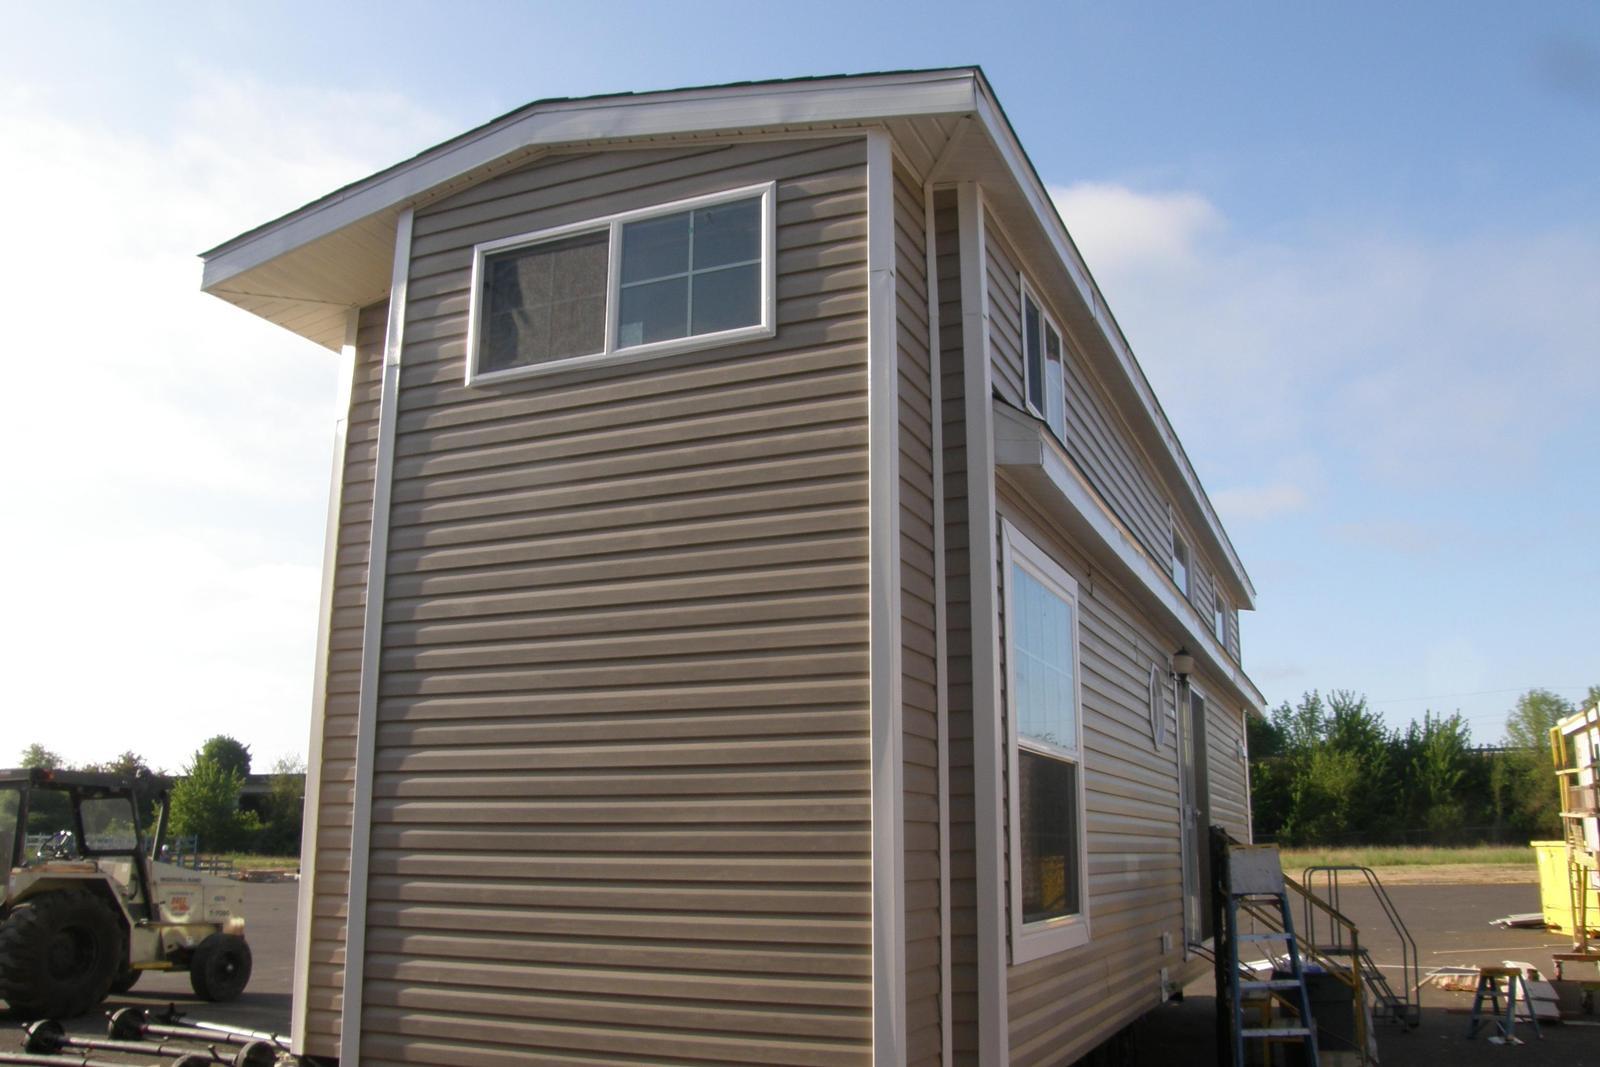 Park Model Homes Skyline Park Model Homes Prices